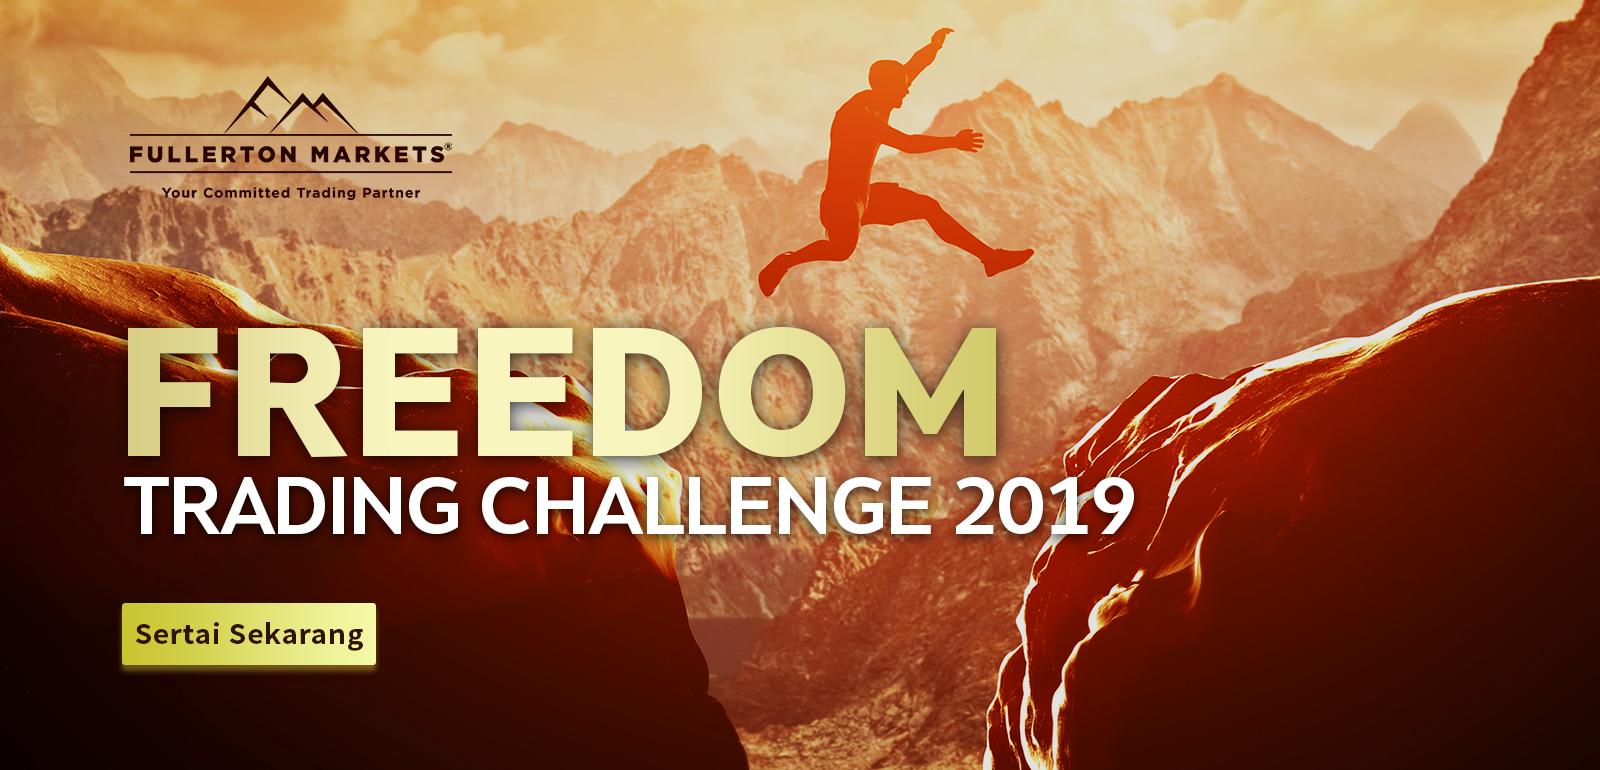 1600x770_freedom-trading-challenge_MS